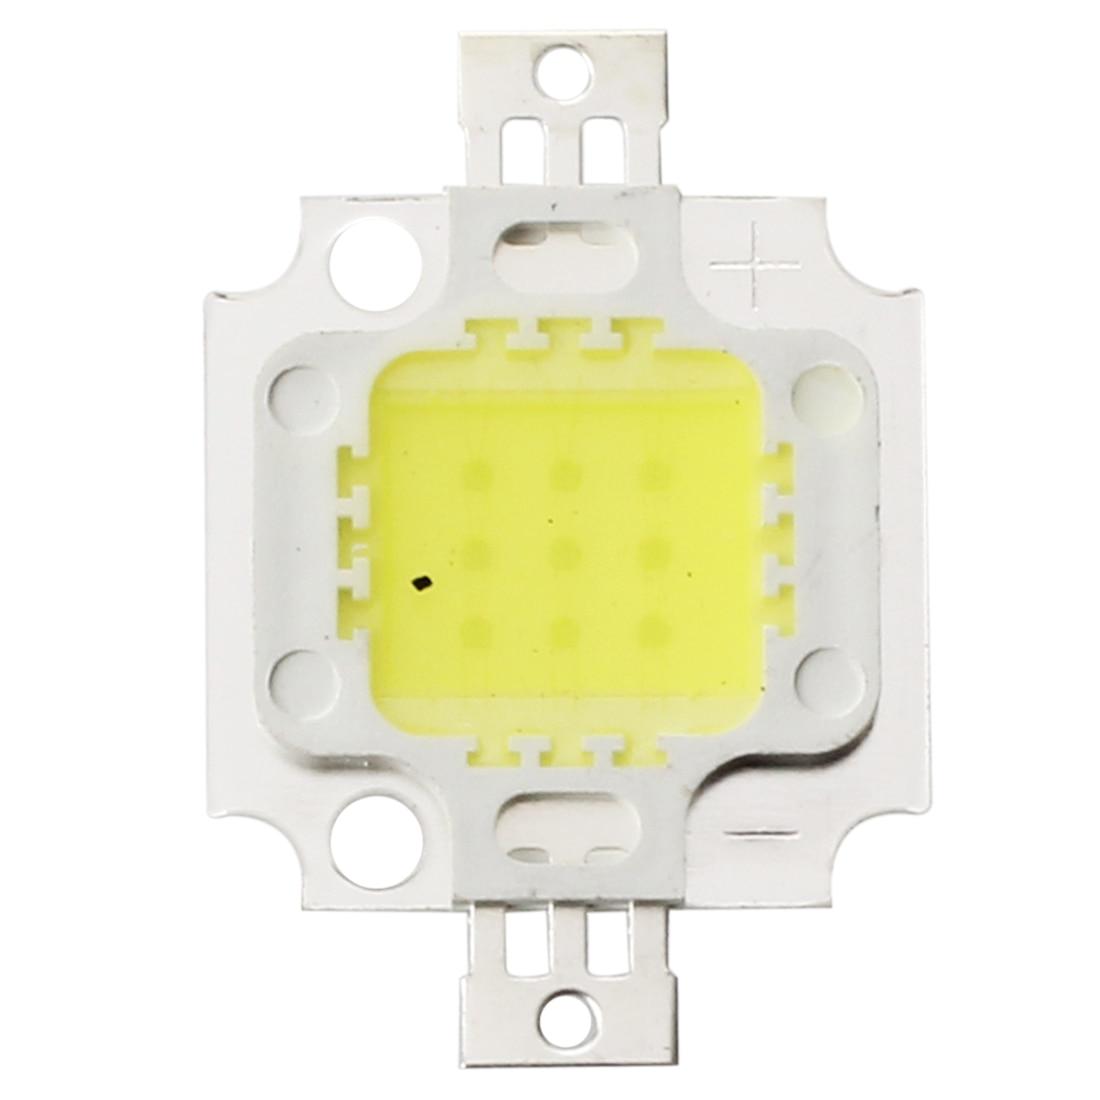 5 x High Power 10W LED Chip Birne Licht Lampe DIY Weiss 750LM 6500K